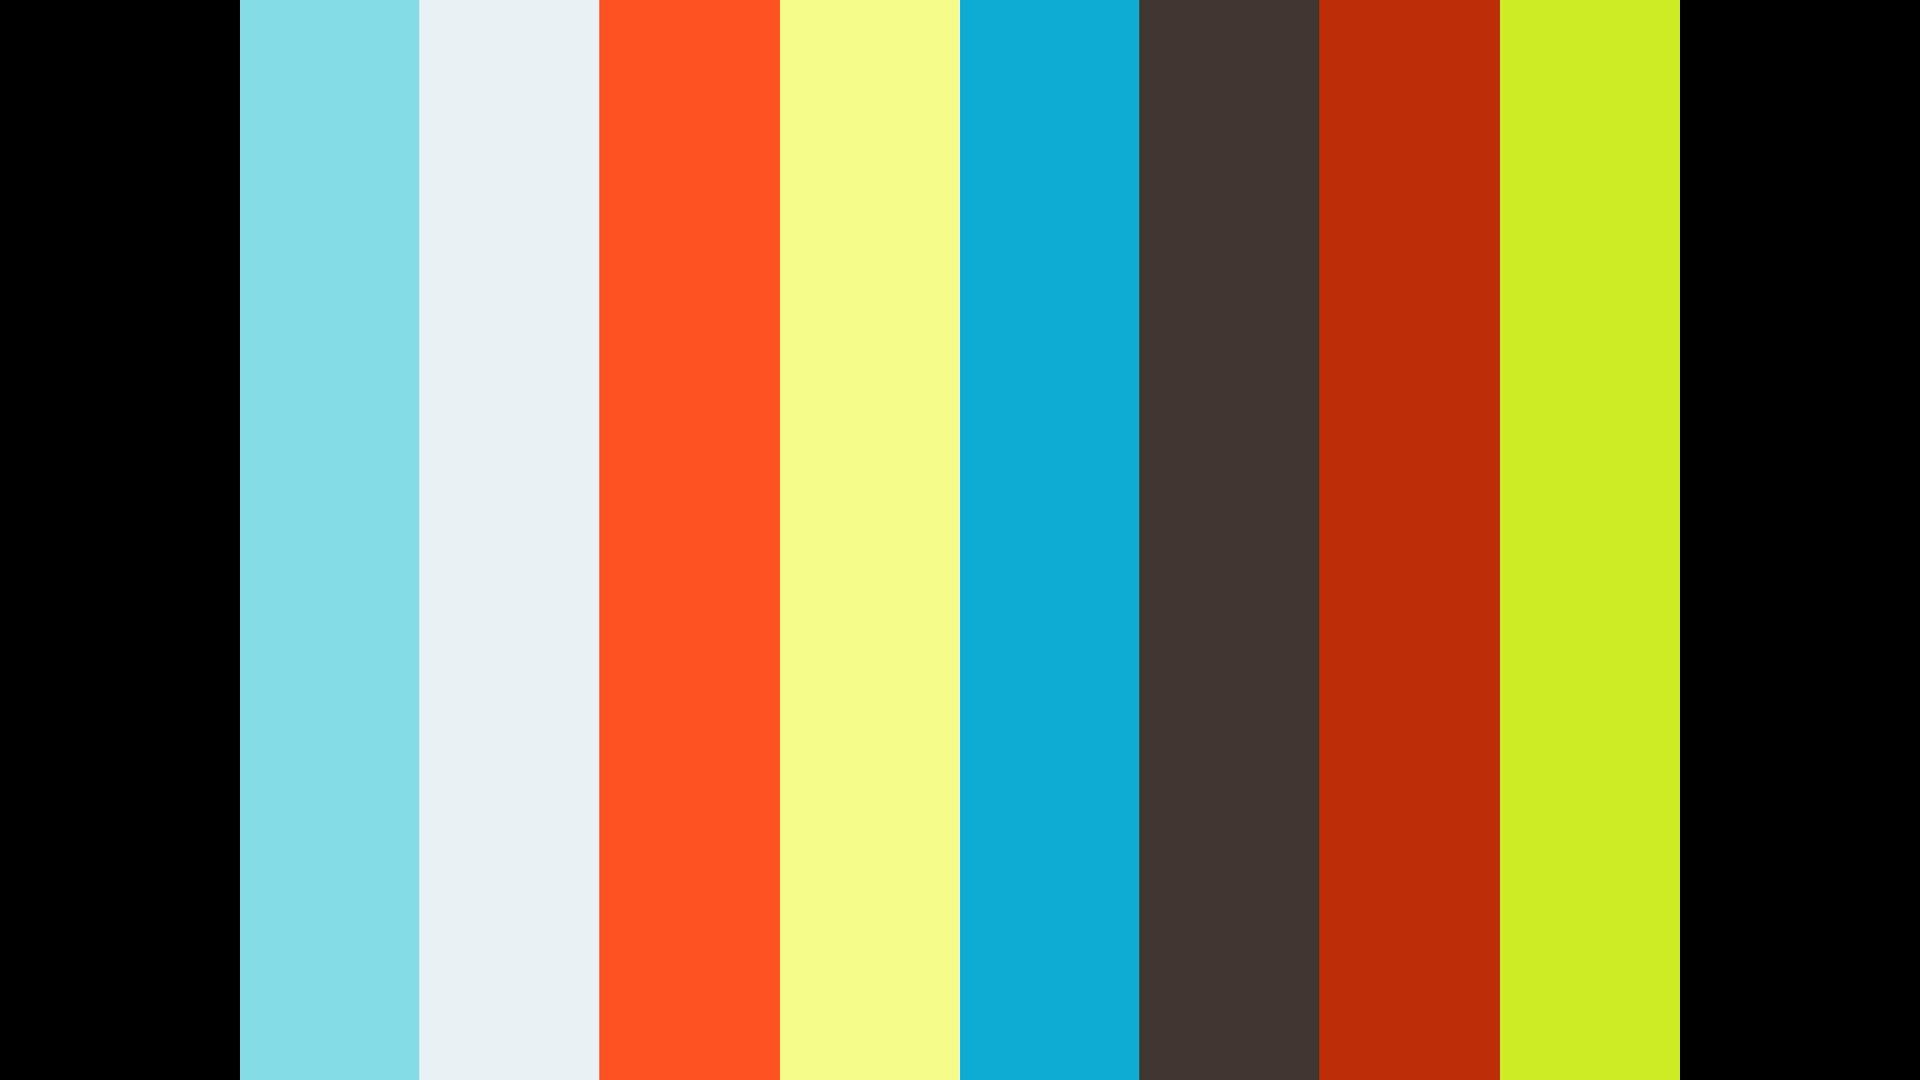 LIVE 23 MARS - ZUMBA - MYRIAM